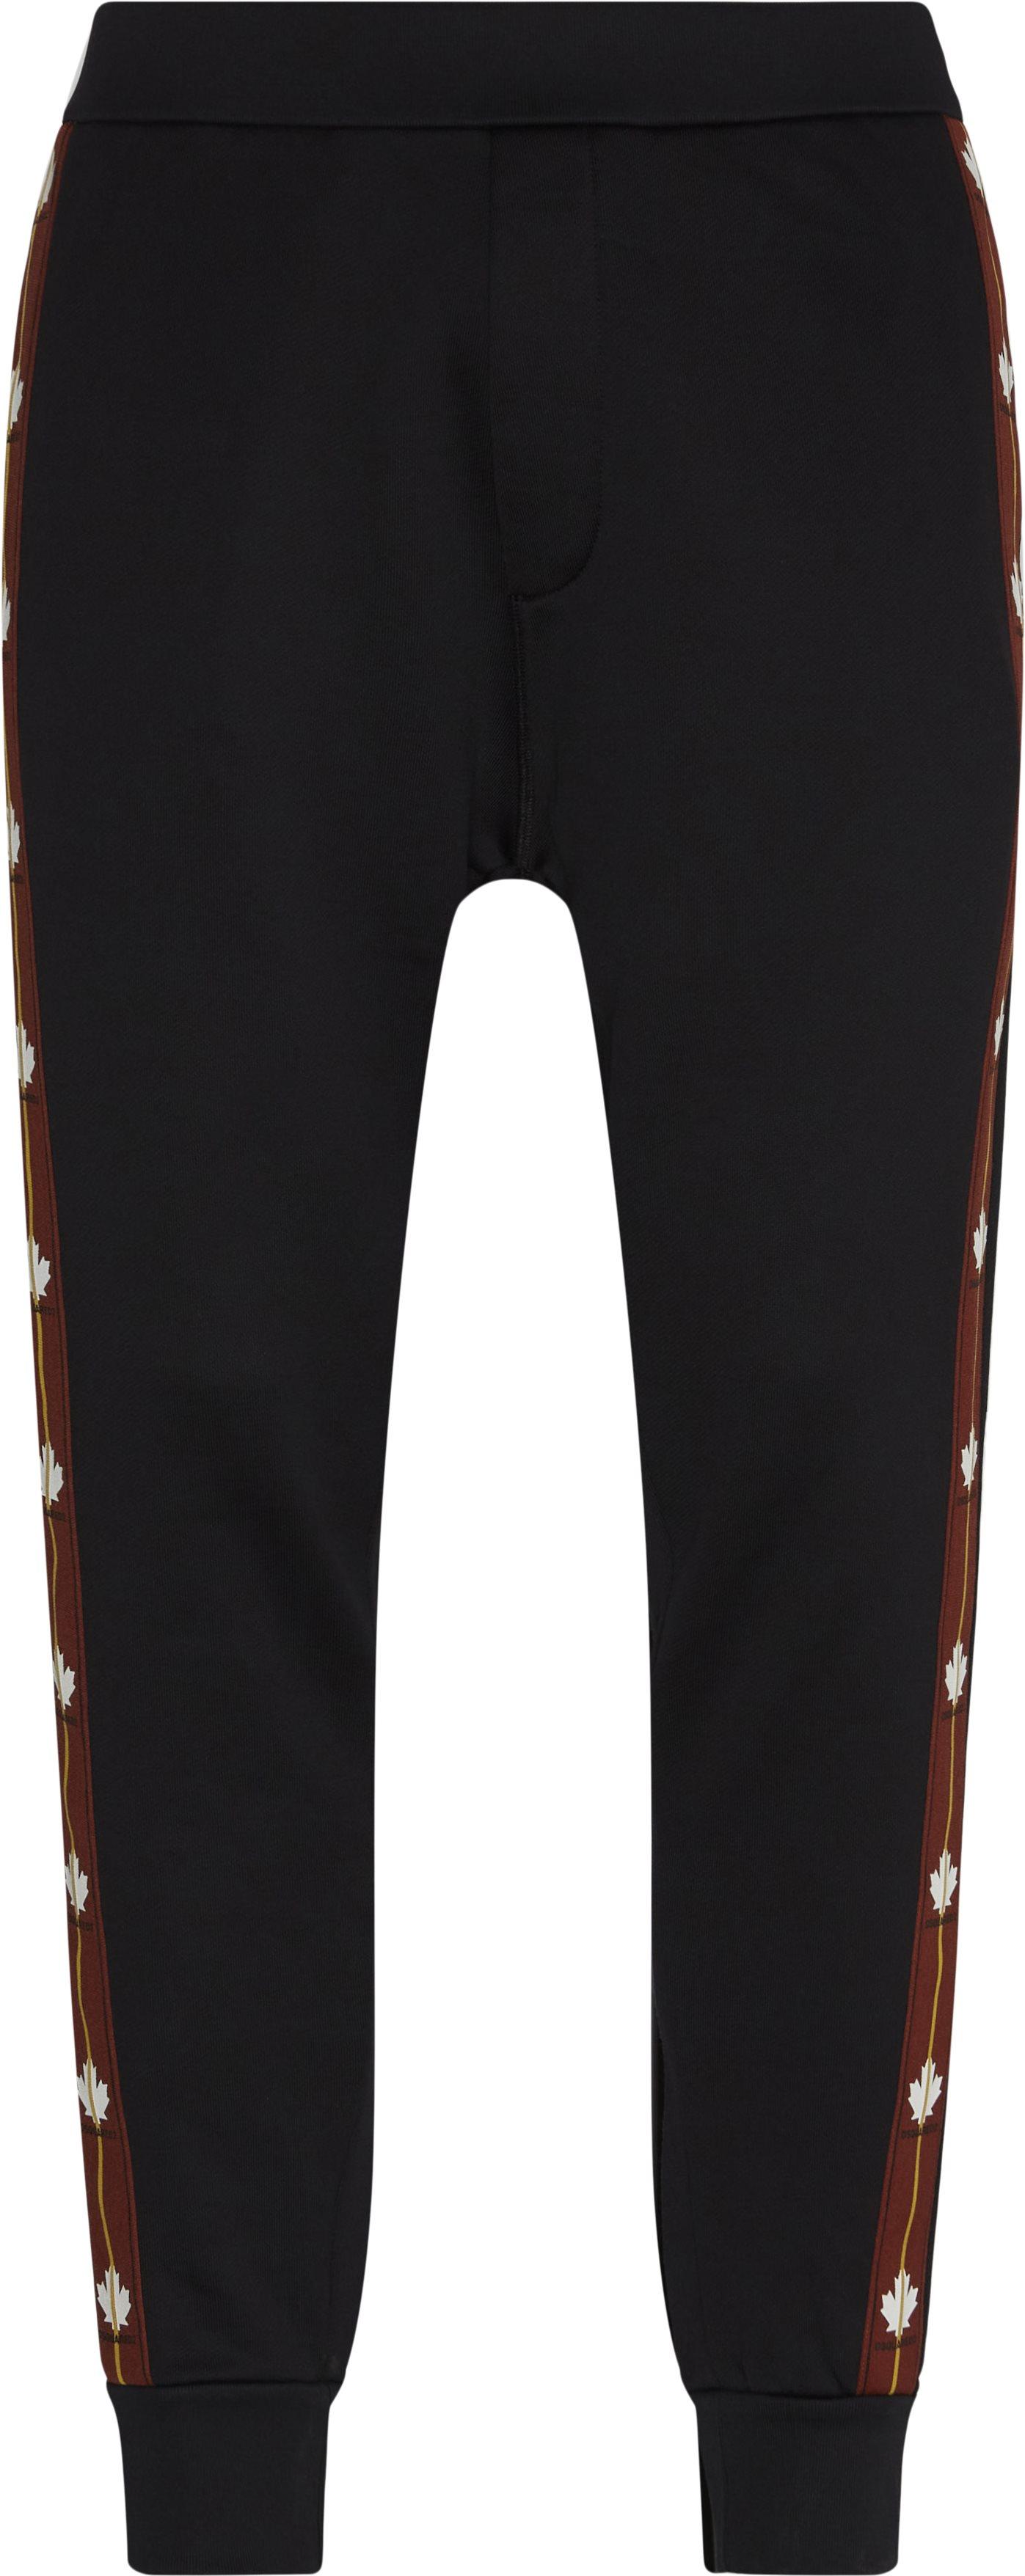 Trackpants - Bukser - Regular fit - Sort